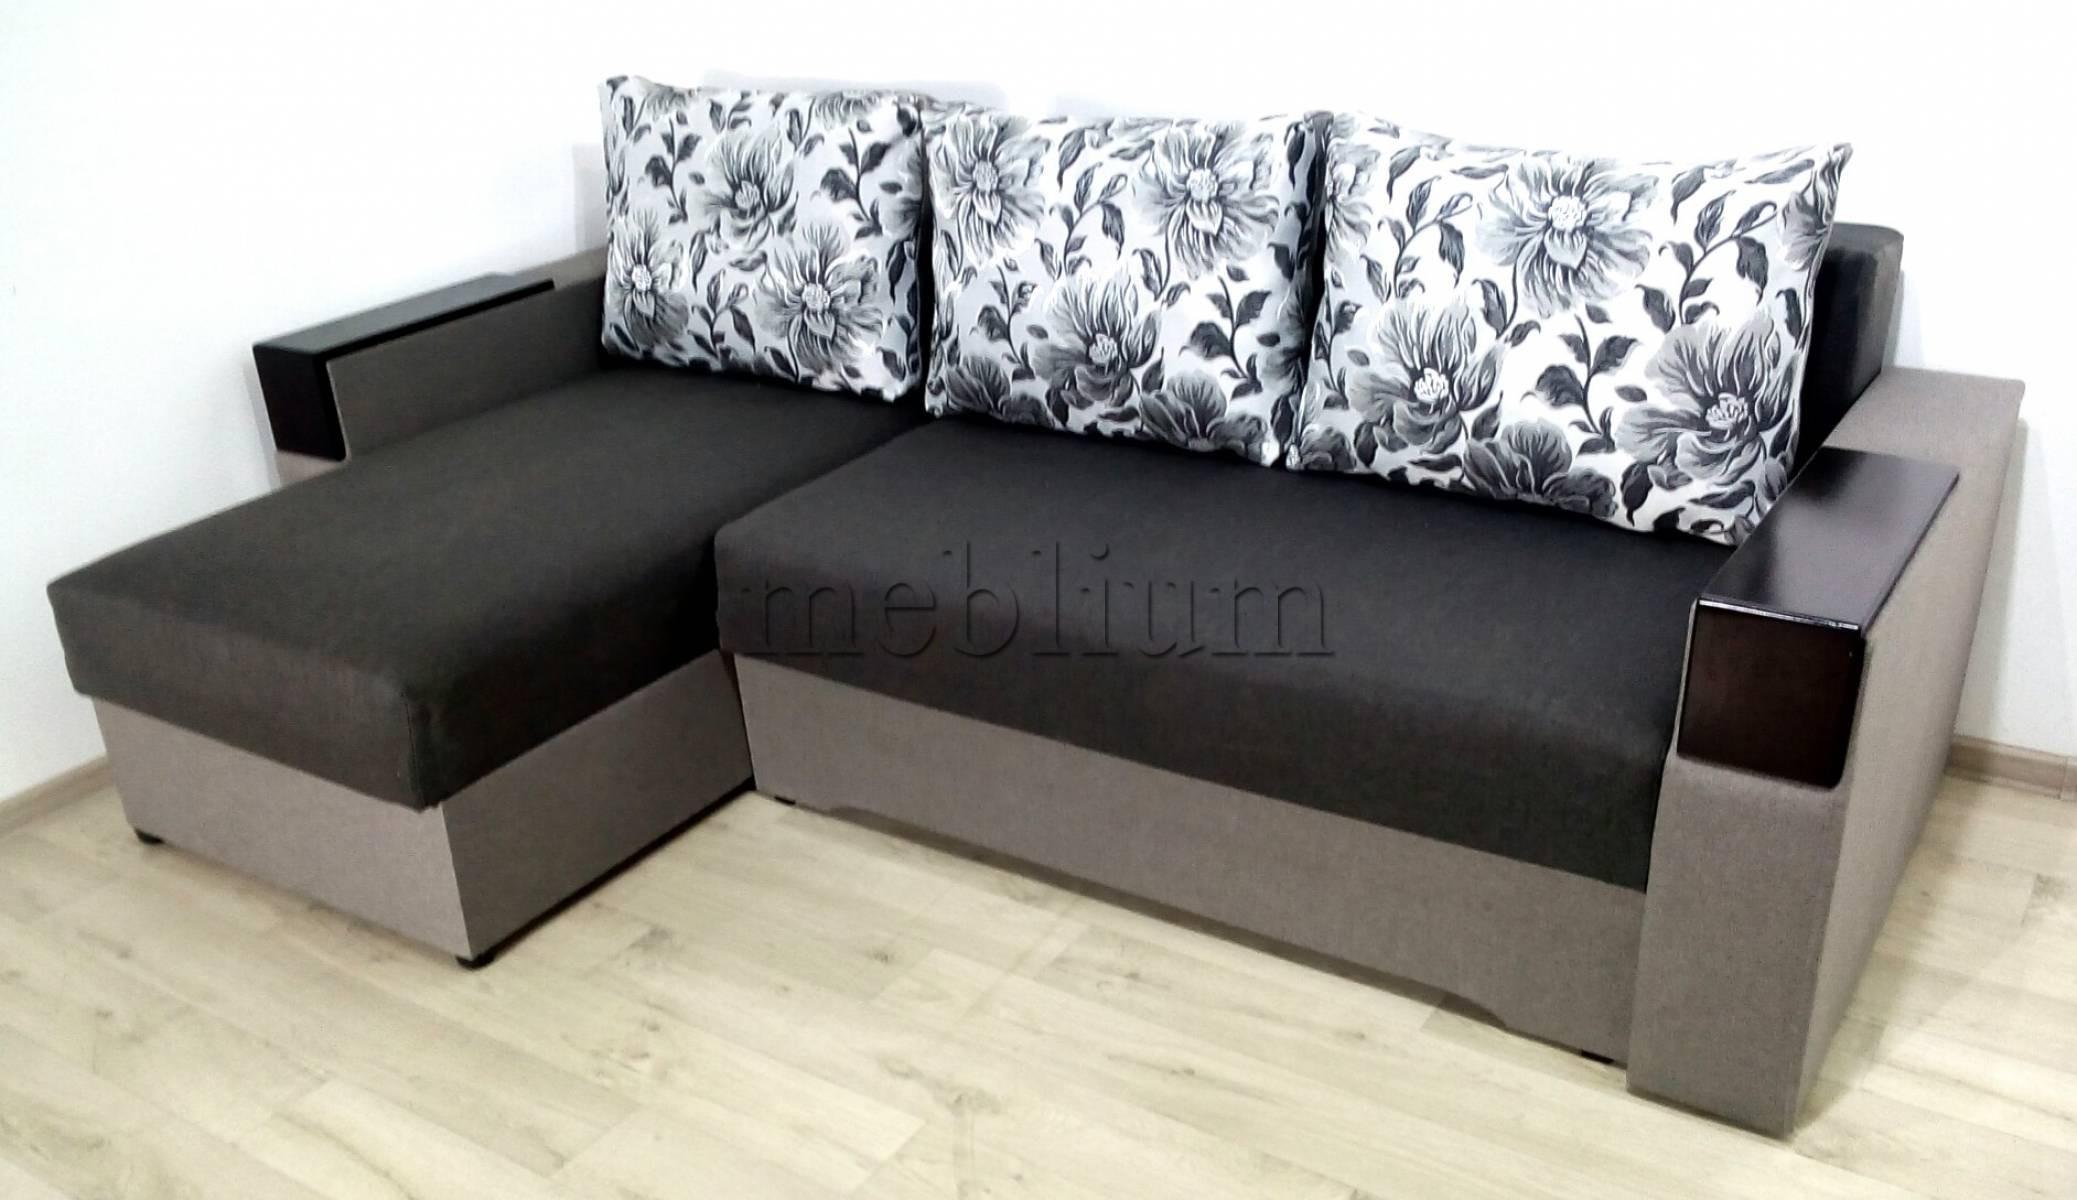 Угловой диван Магнолия универсал -3 Siryj Ткань: Seryj